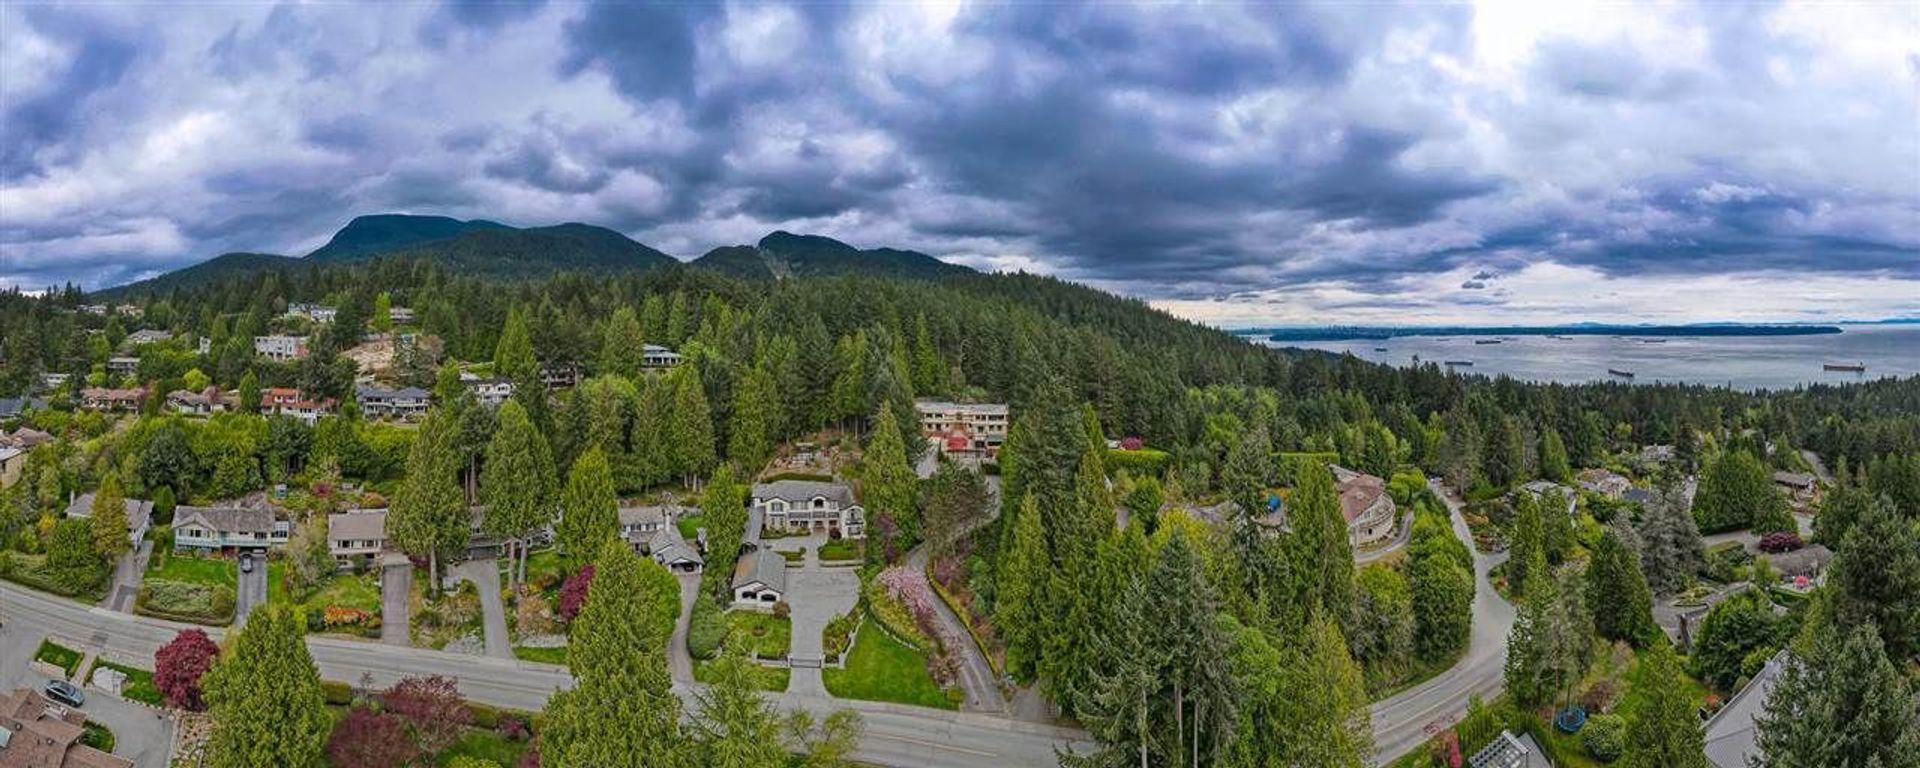 4556-woodgreen-drive-cypress-park-estates-west-vancouver-32 at 4556 Woodgreen Drive, Cypress Park Estates, West Vancouver